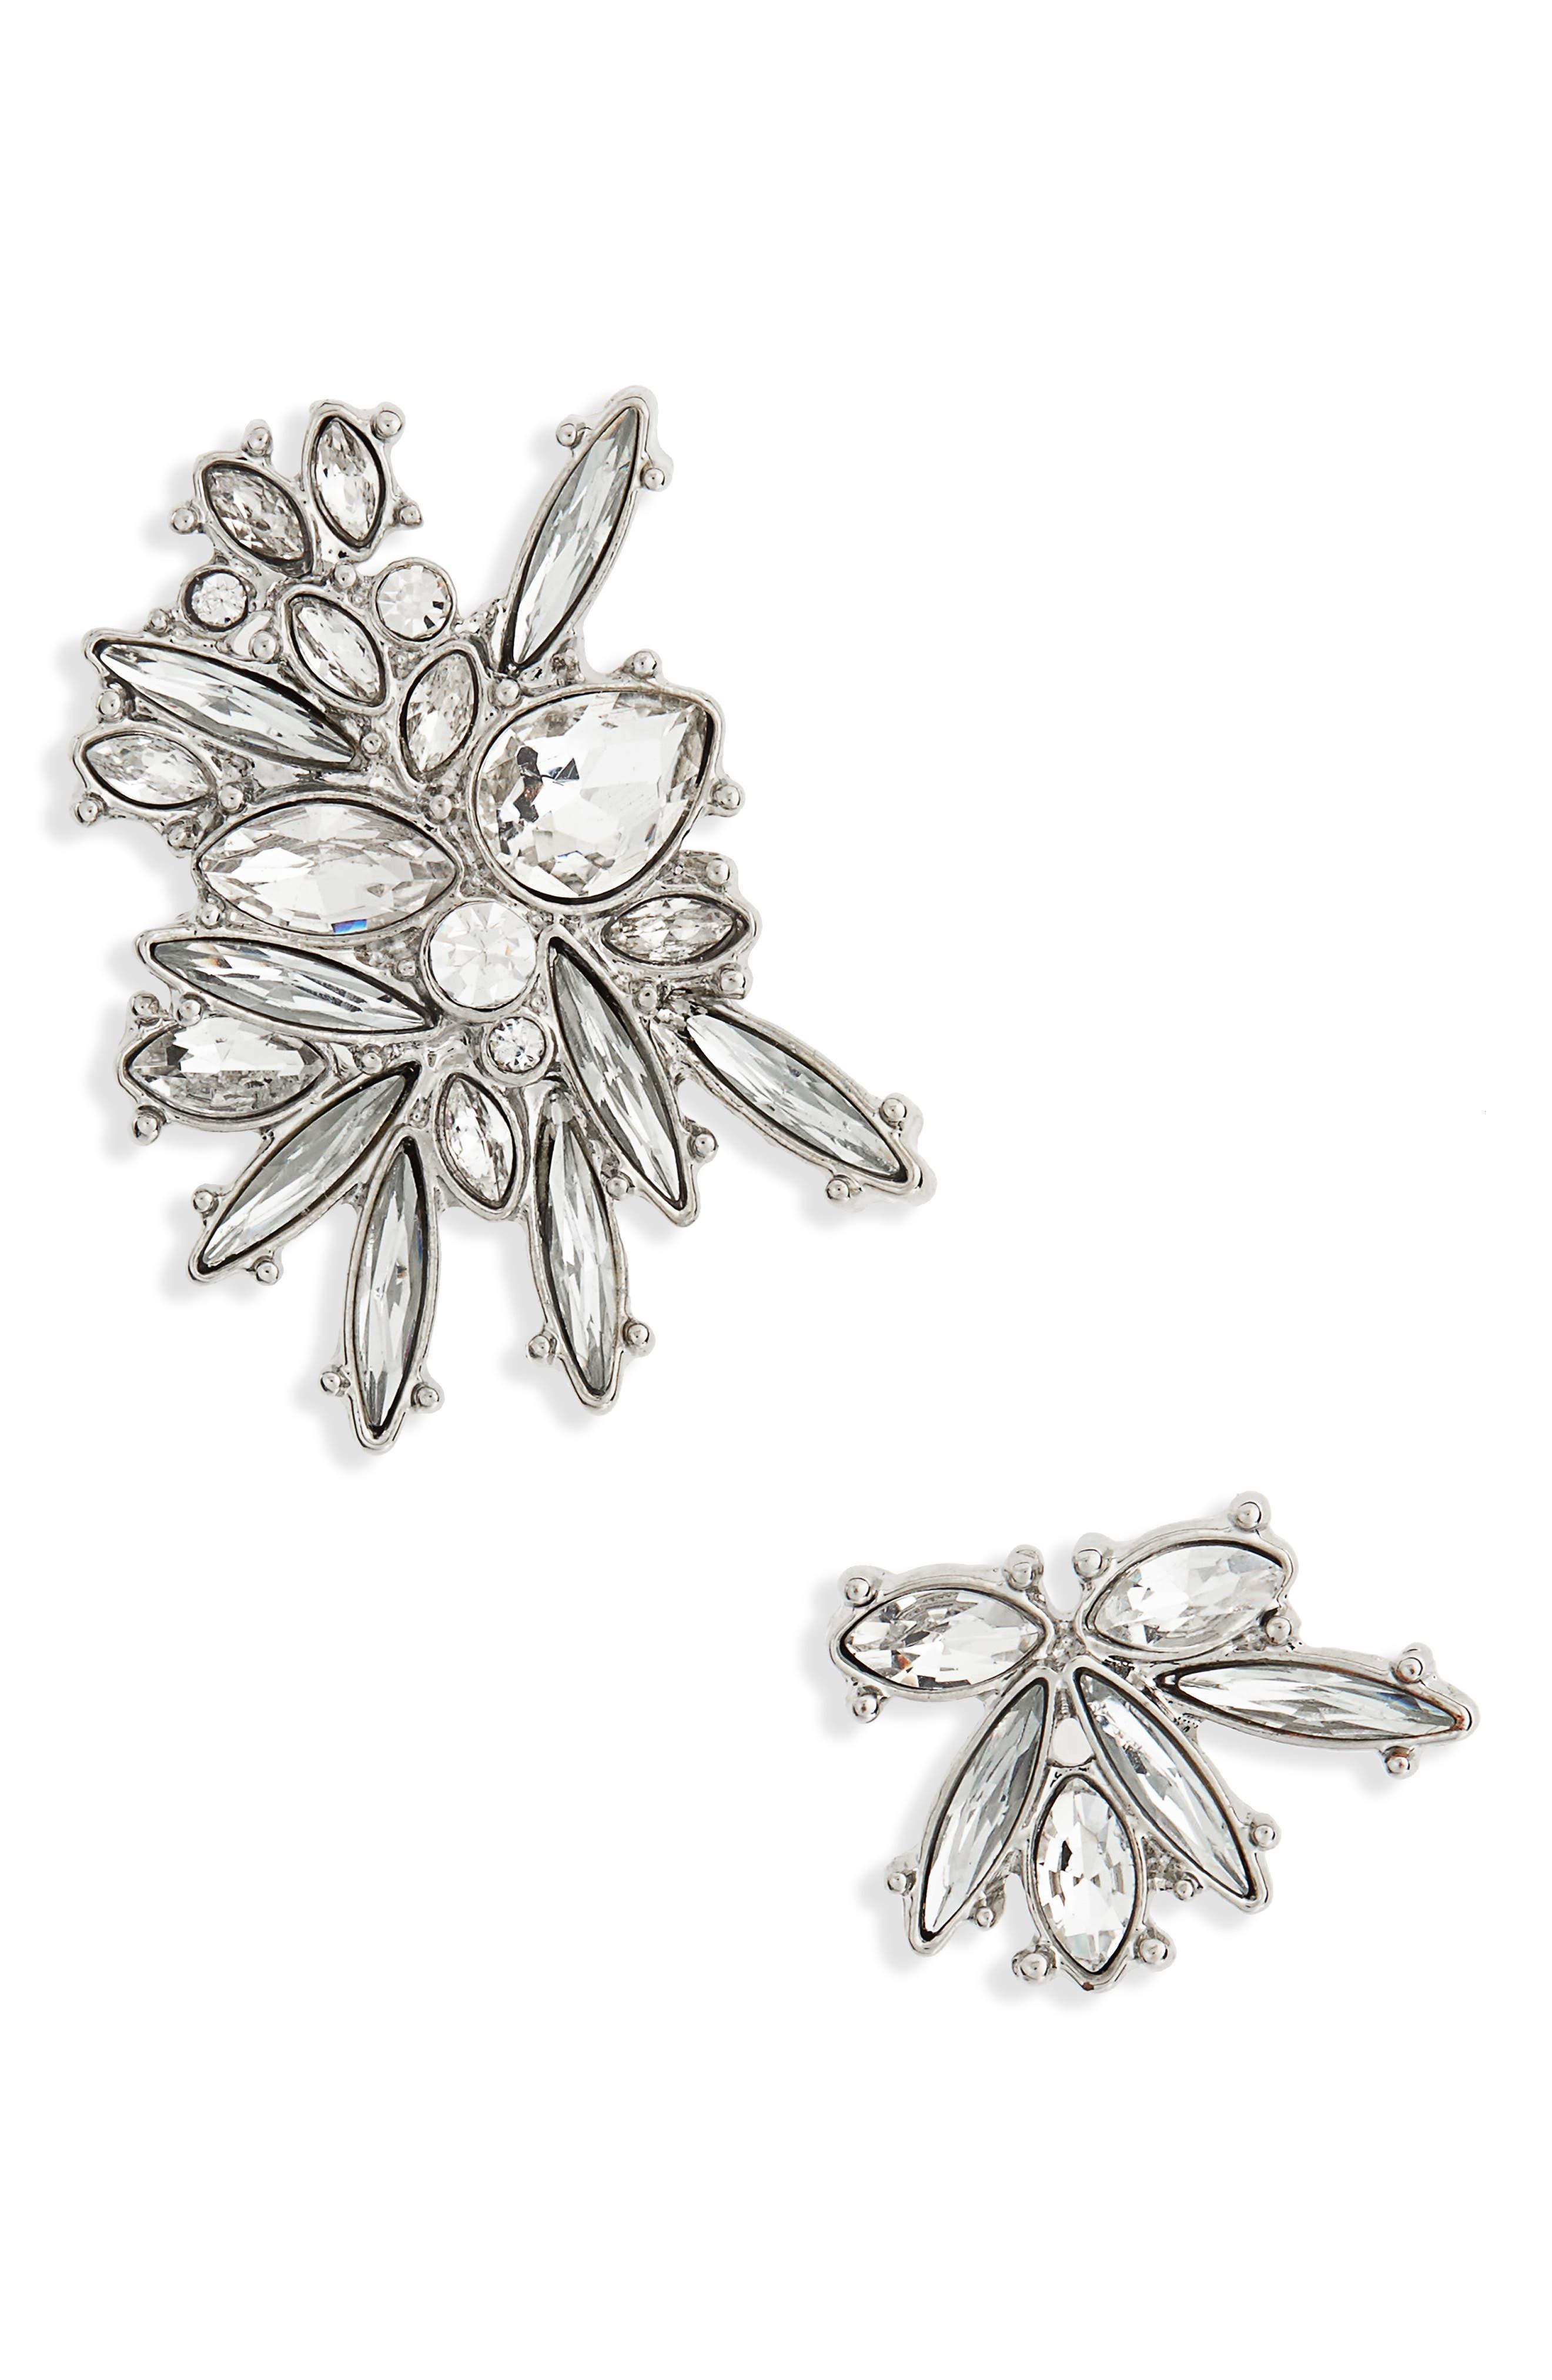 Titania Crystal Stud Earrings,                             Main thumbnail 1, color,                             710